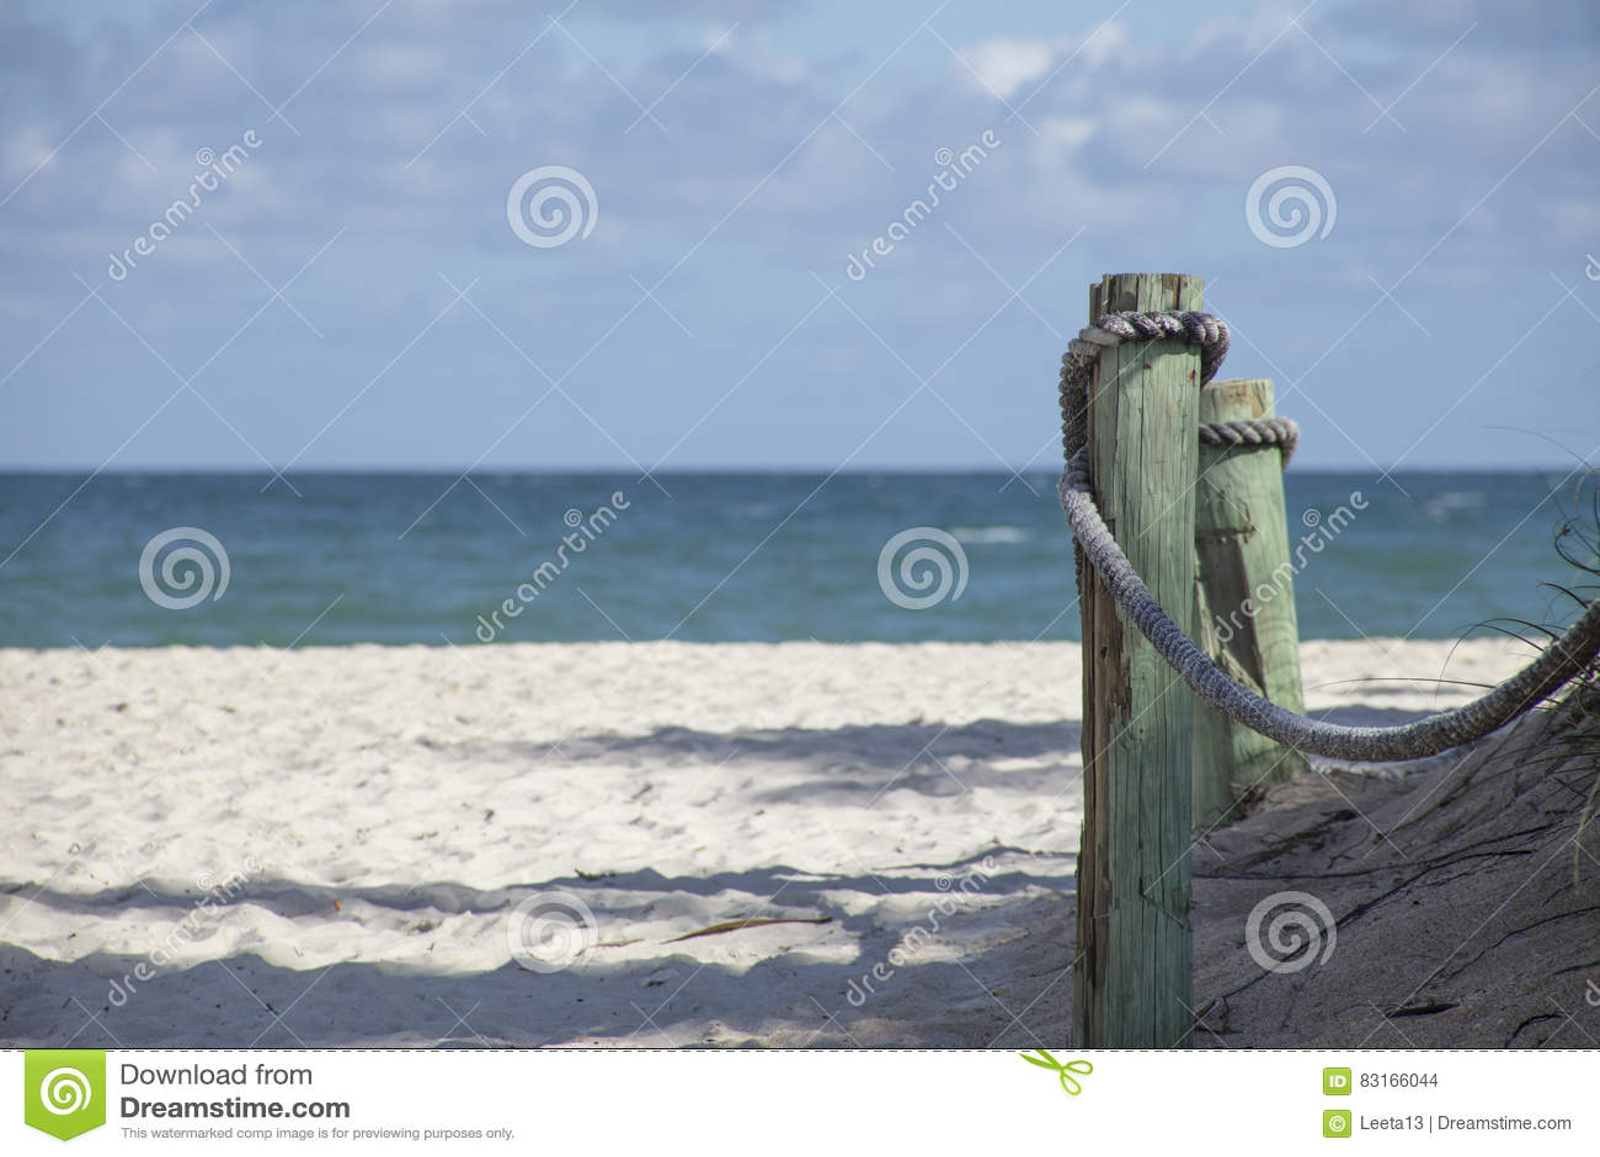 Wood Piling on Beach